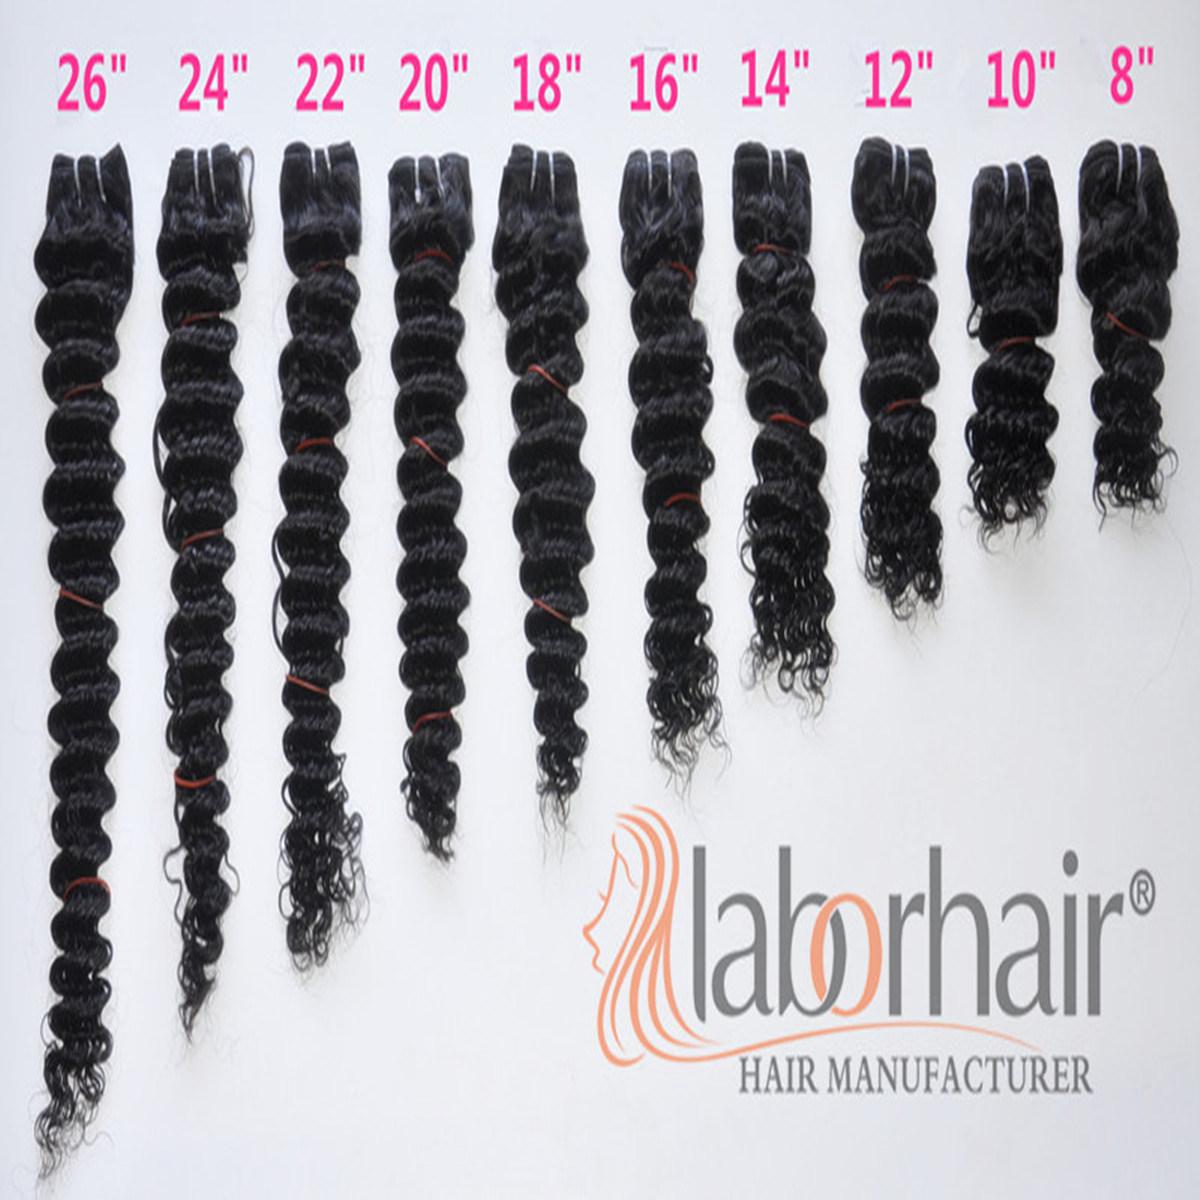 Labor Hair Products Brazilian Hair Weave Bundles Deep Curly Virgin Hair 105g, Top Human Hair Extension Bundles